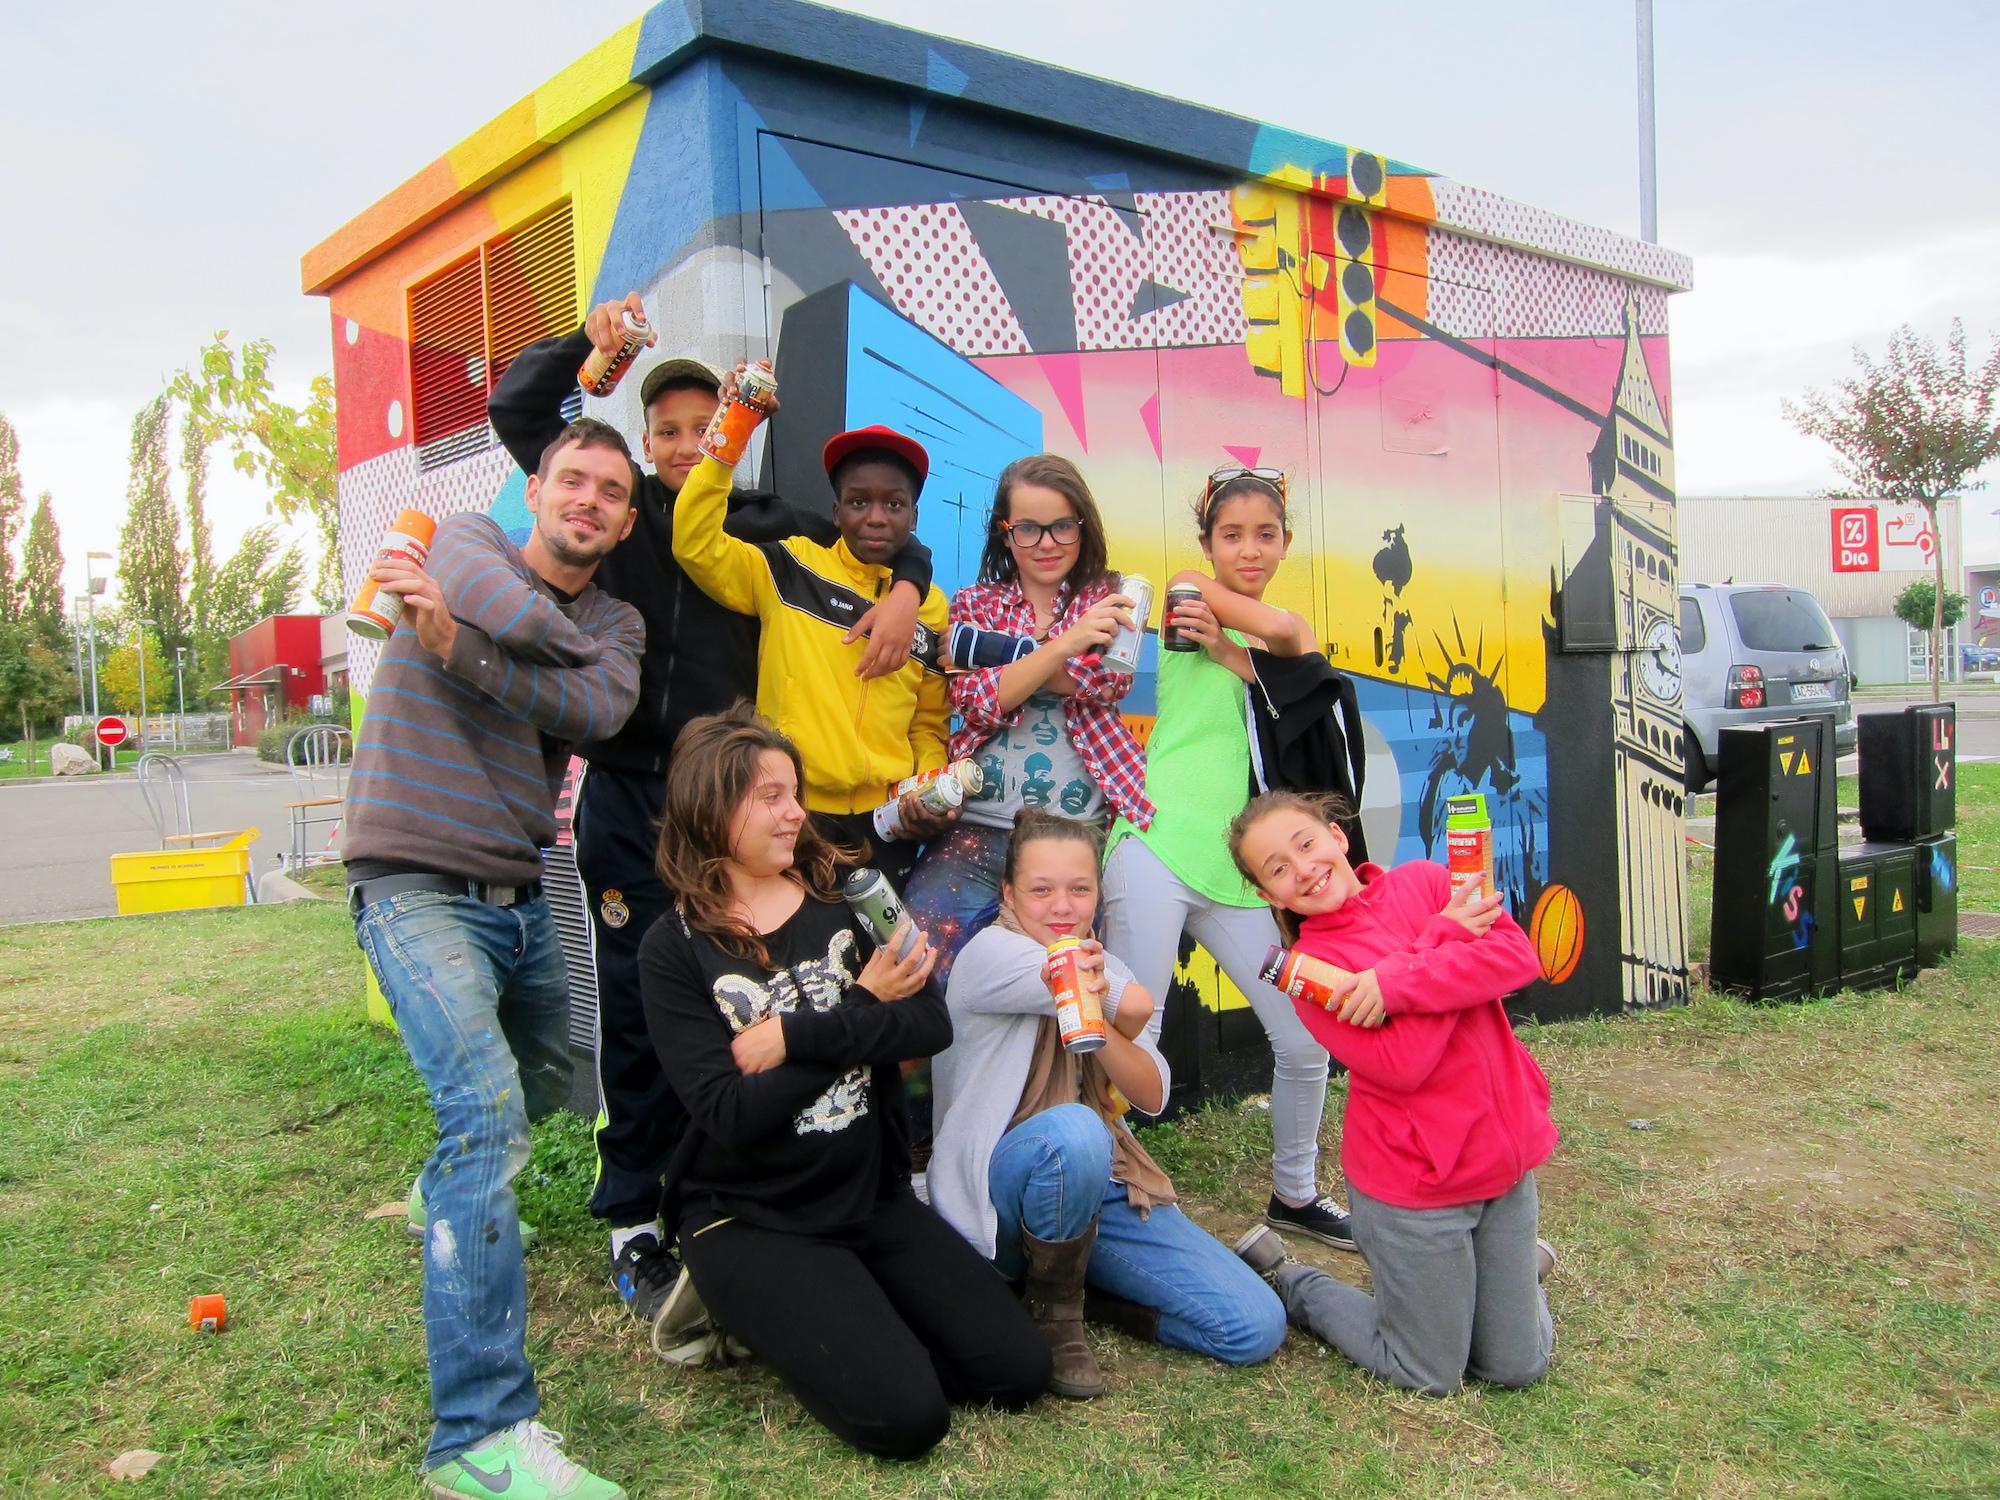 transformateur-atelier-graffiti-chantier-jeunes-montauban